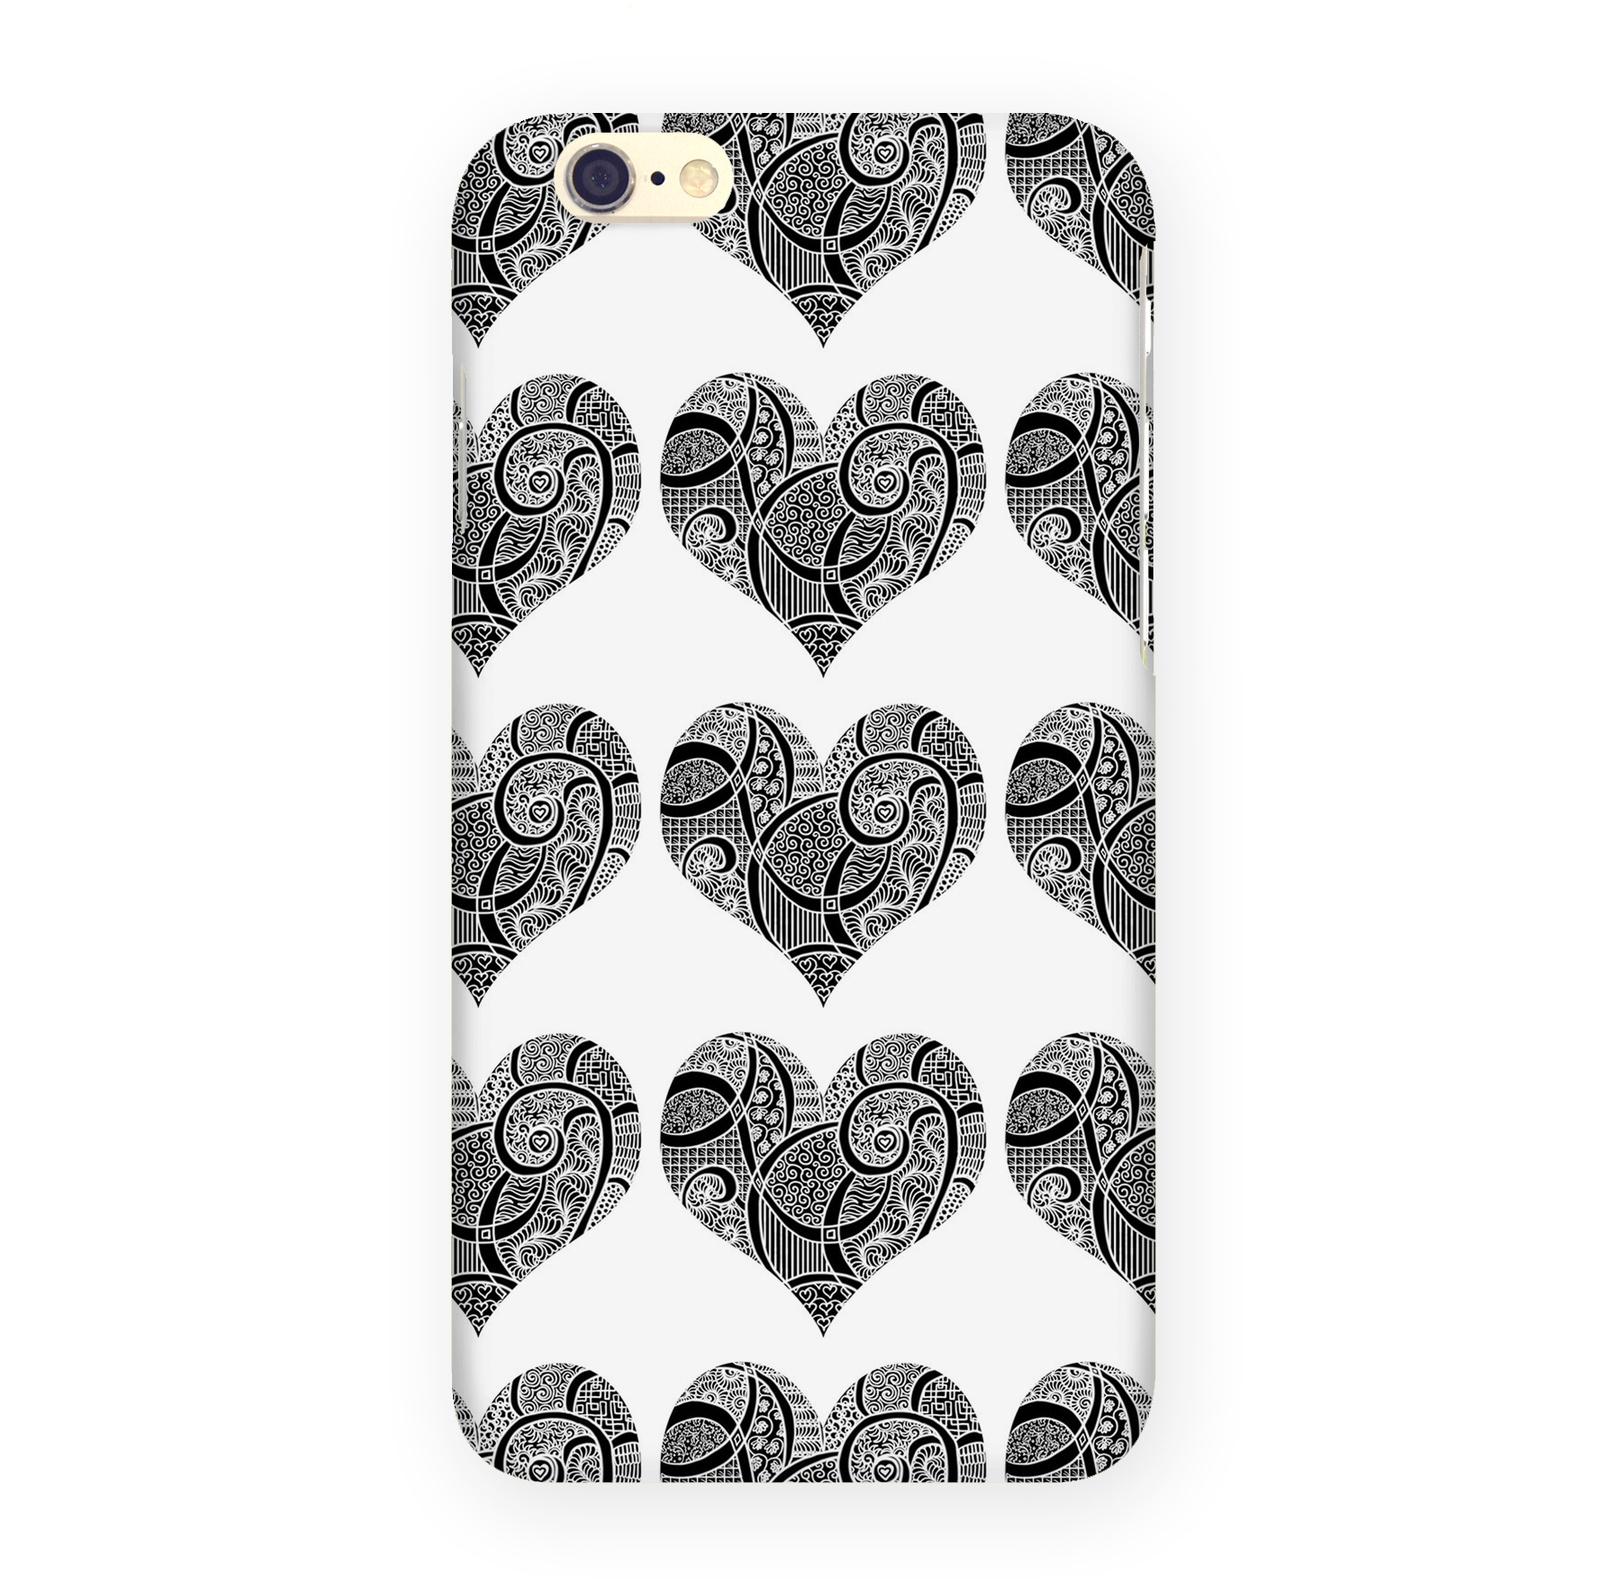 Чехол Mitya Veselkov Зентангл-сердца для iPhone 6, IP6.MITYA-323, белый, черный чехол для iphone 6 mitya veselkov жостовский узор 1